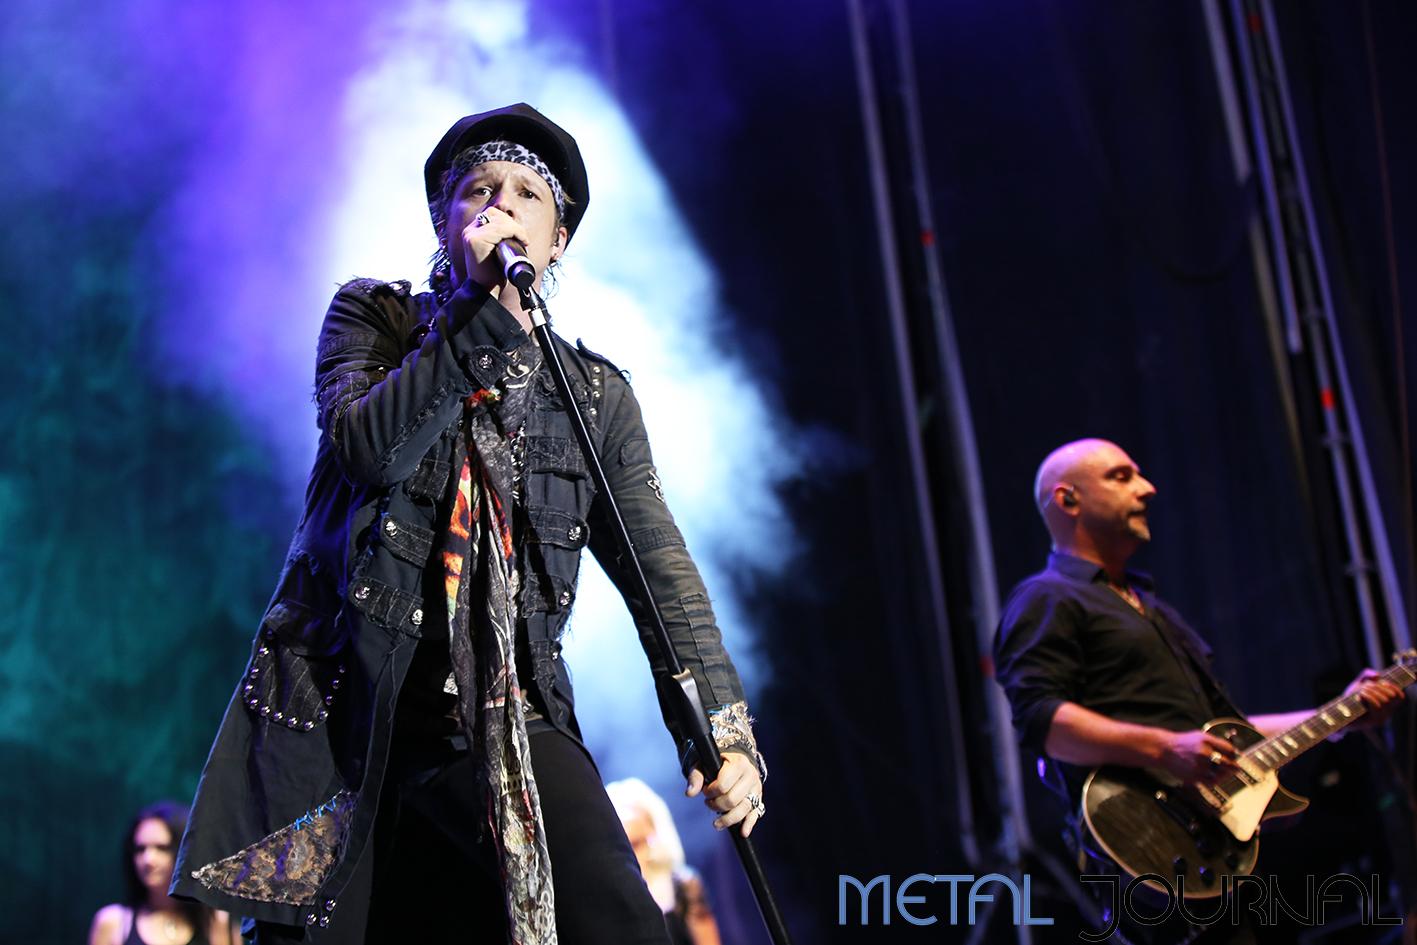 avantasia- leyendas del rock 2019 metal journal pic 1